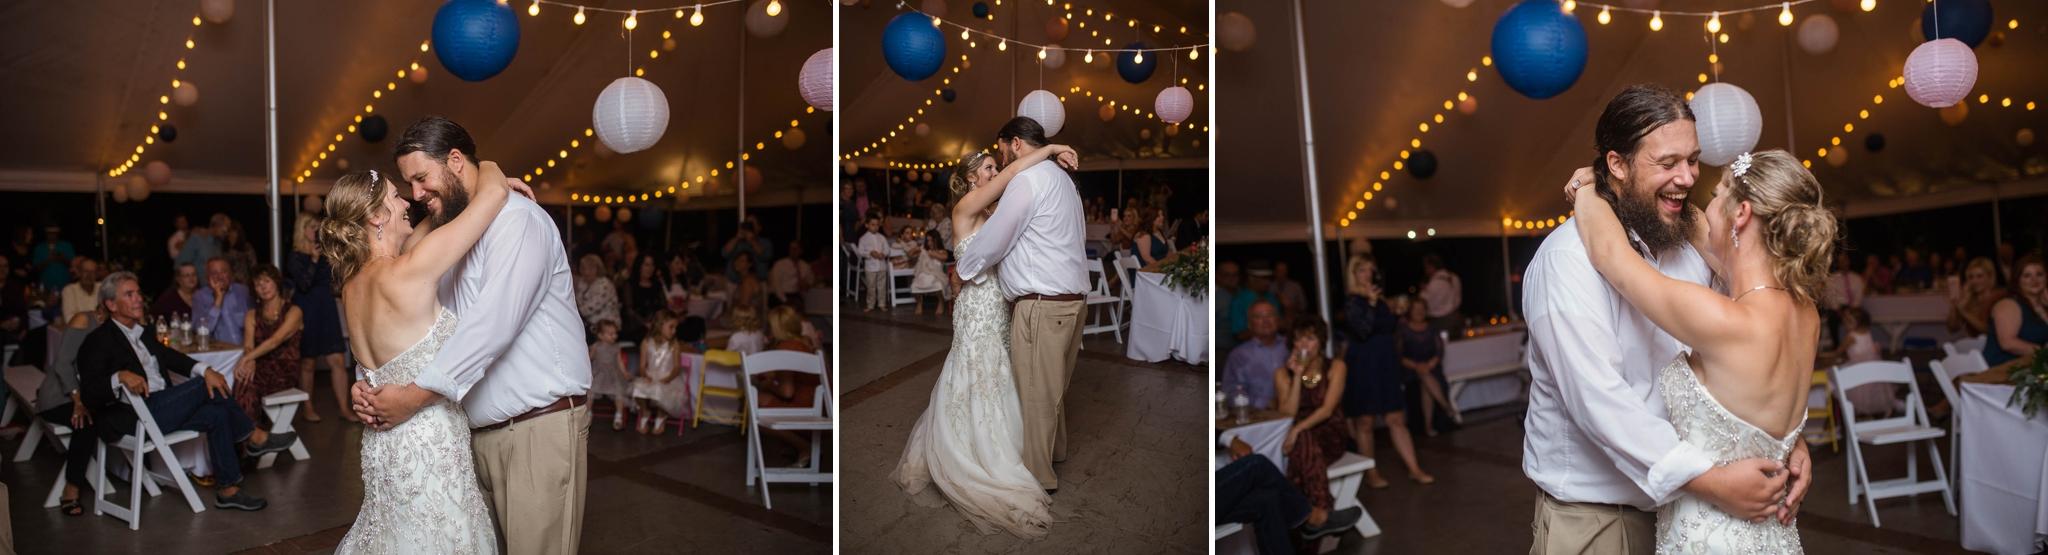 Wedding Photography at the Timberlake Earth Sanctuary in Whitsett, NC - Raleigh North Carolina Wedding Photographer 21.jpg